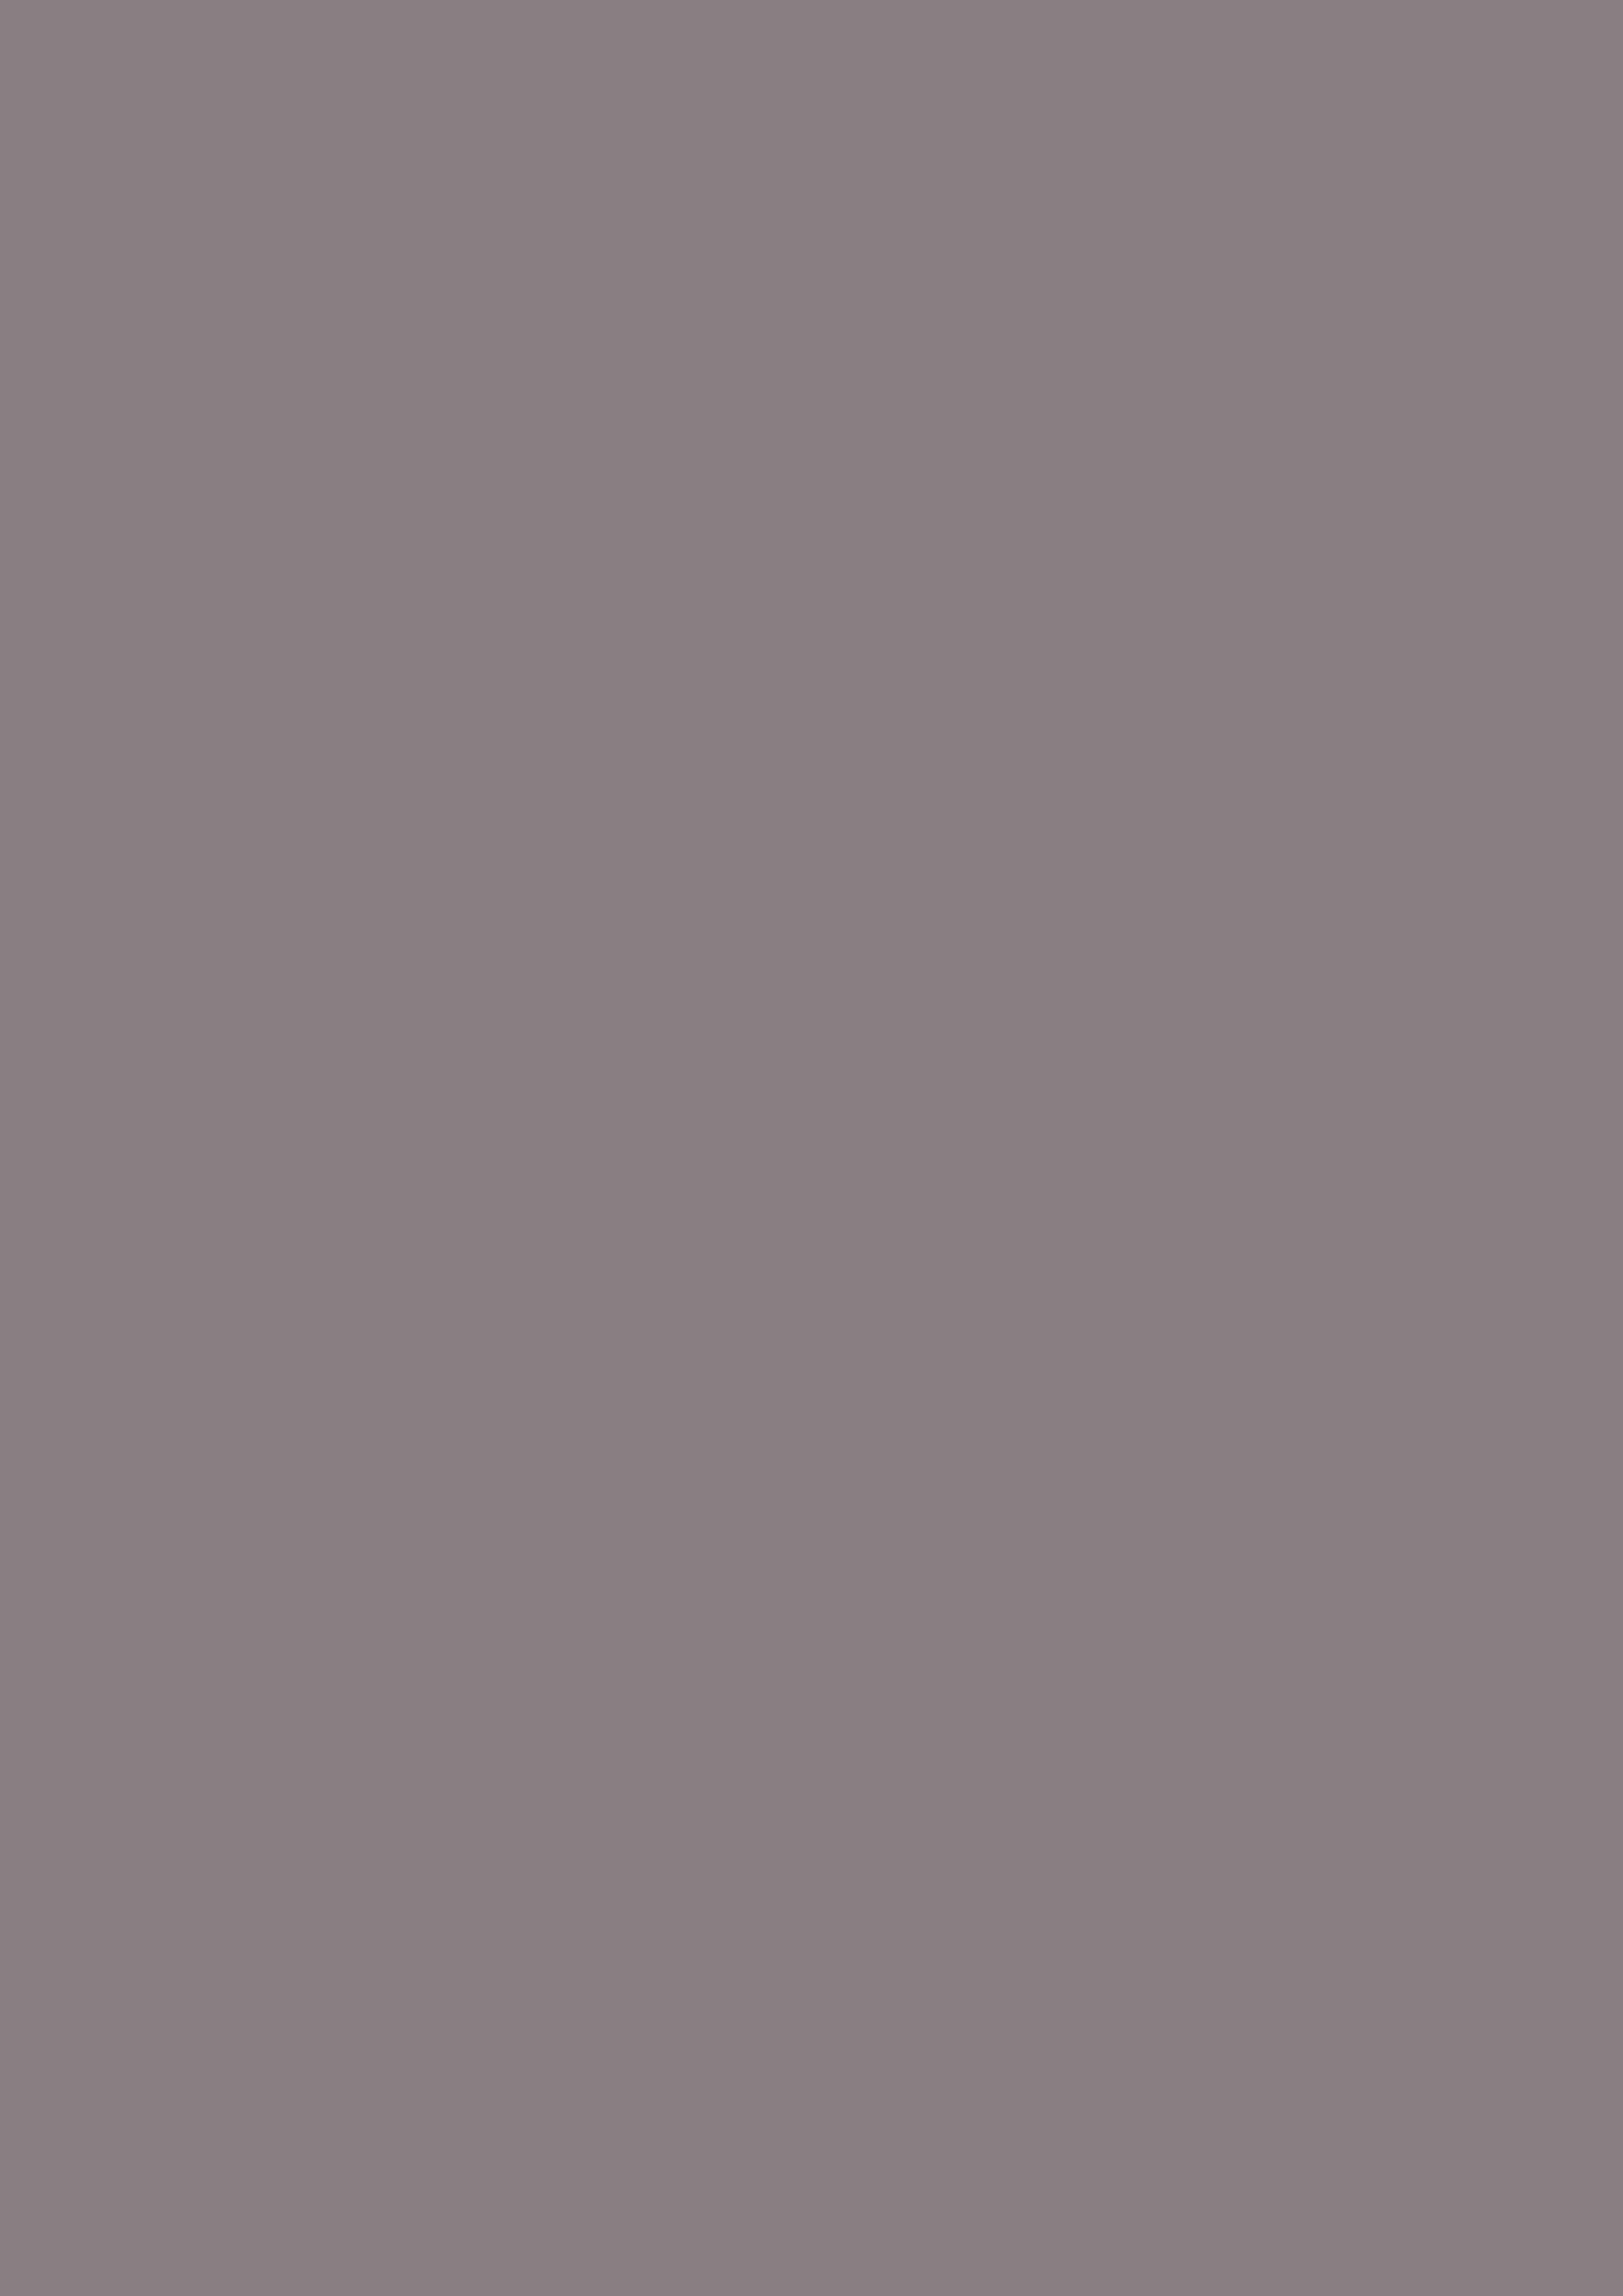 2480x3508 Rocket Metallic Solid Color Background